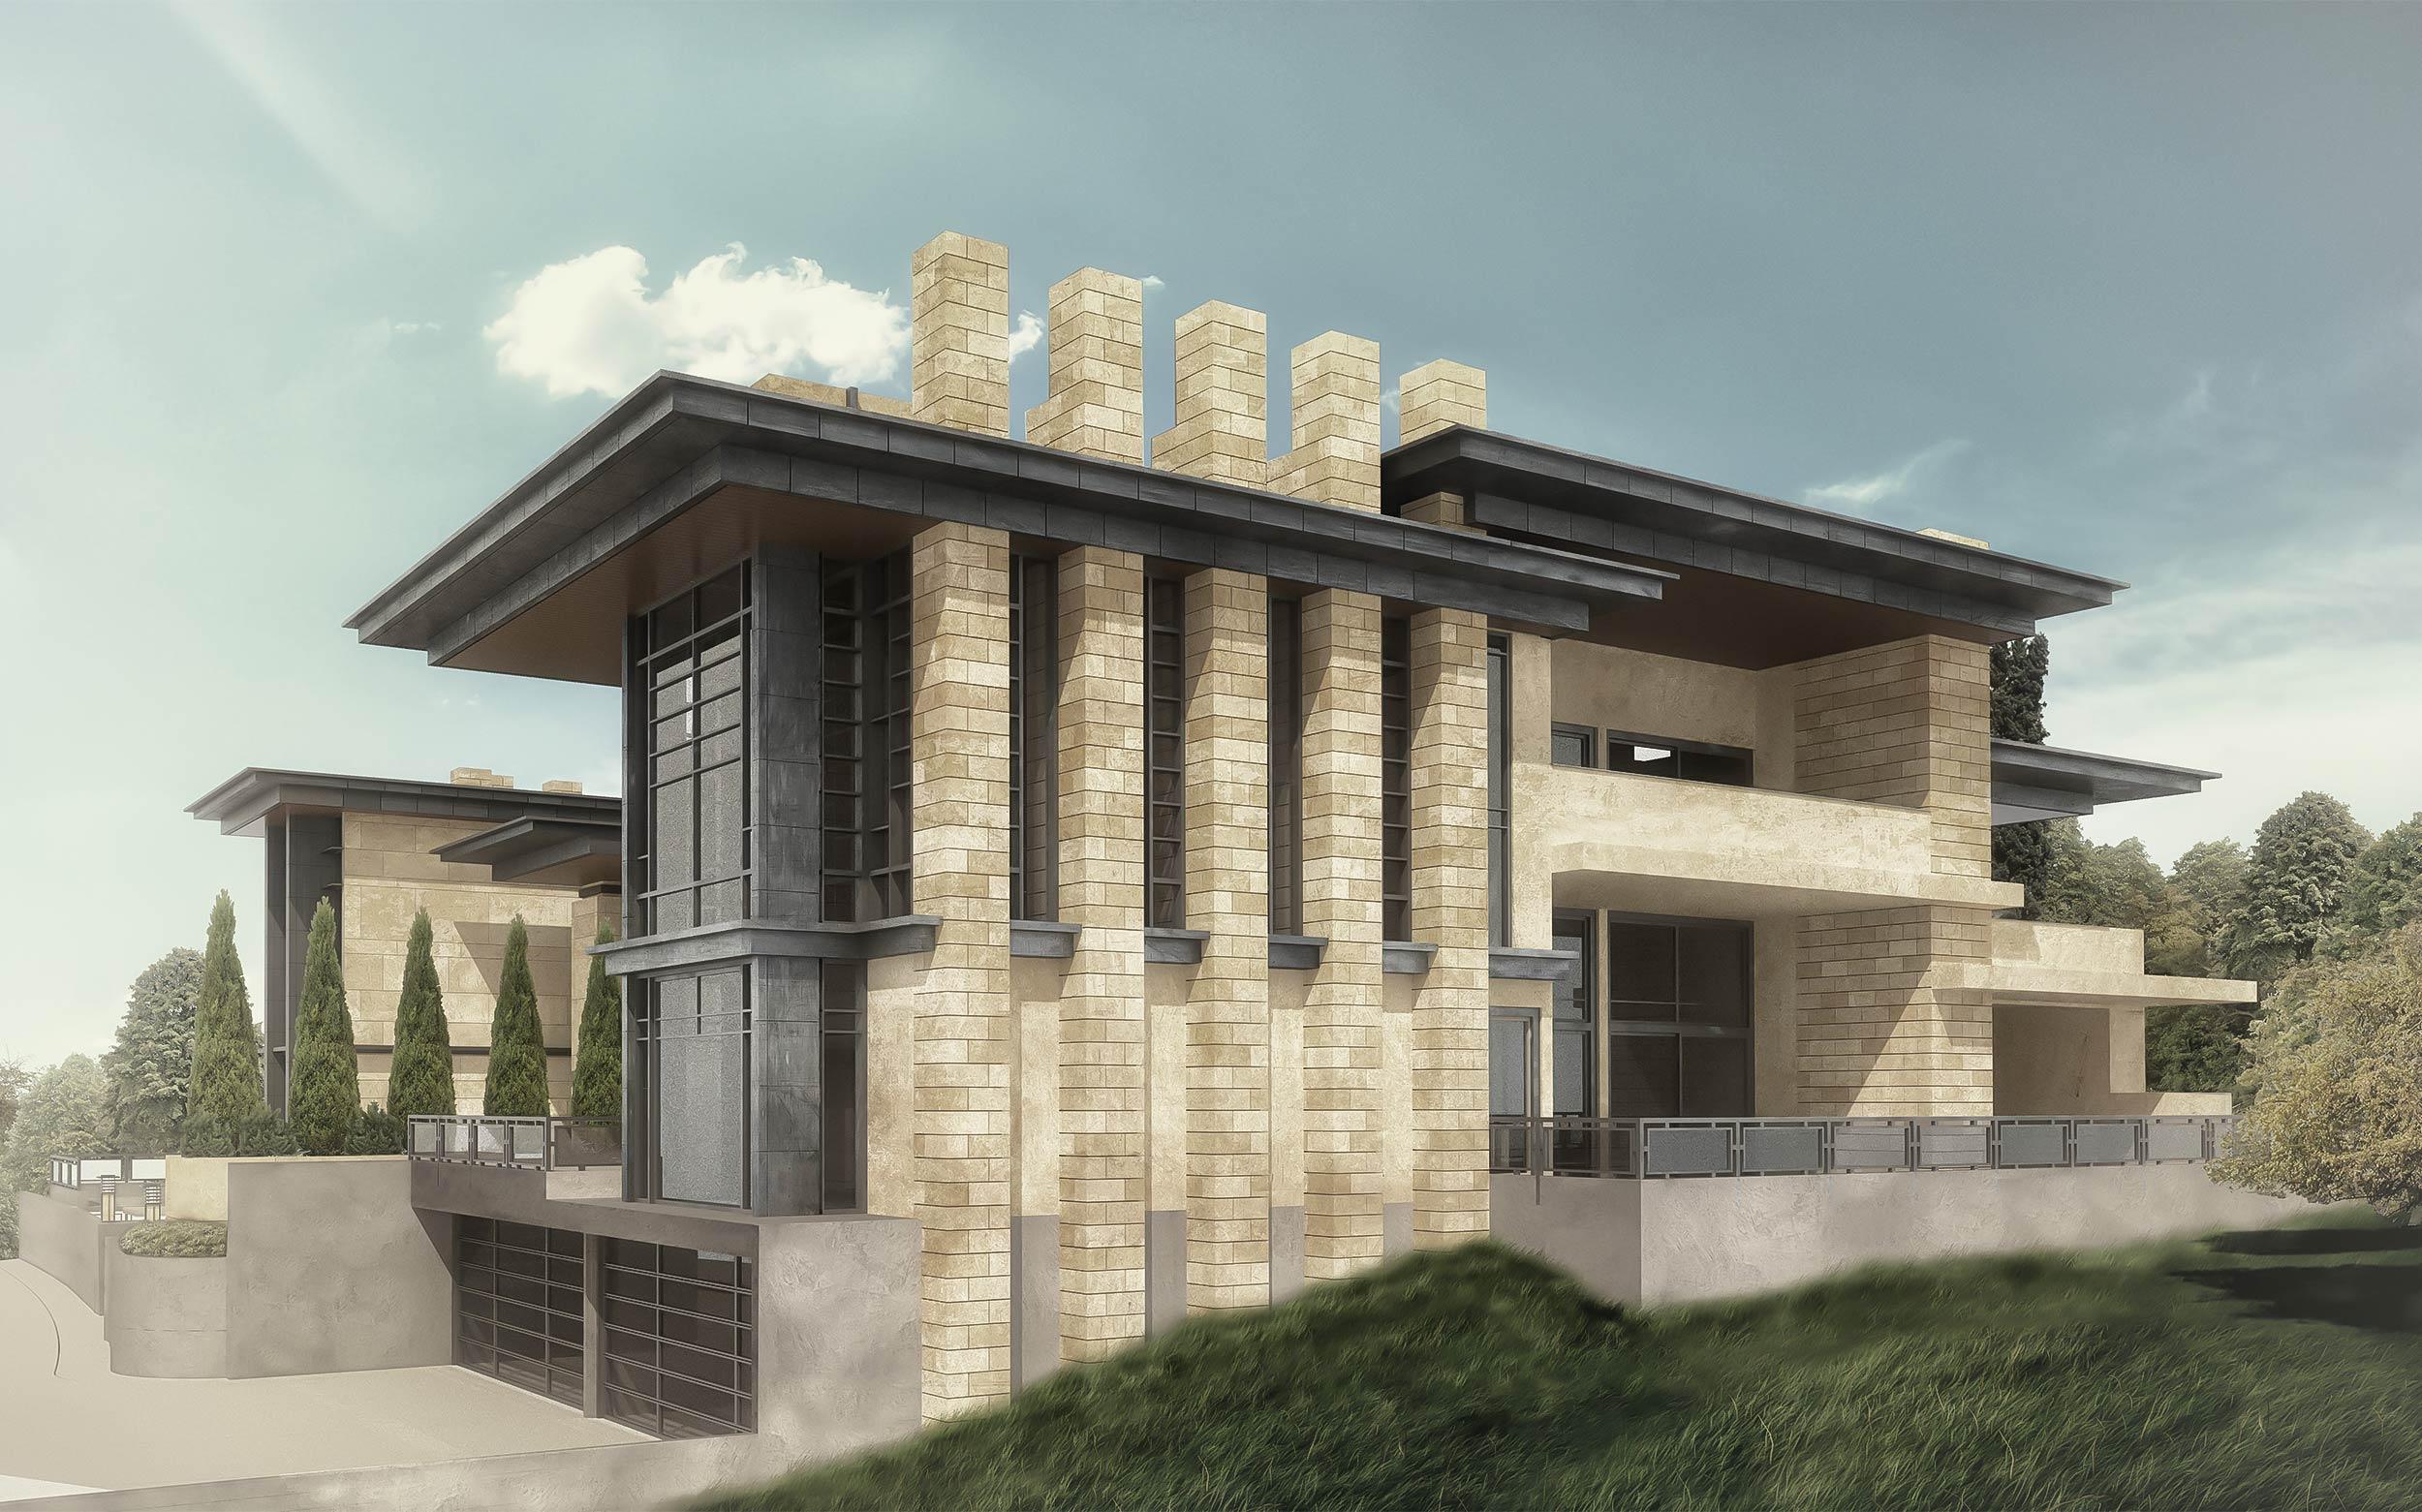 malibu-house-archillusion-design-01.jpg